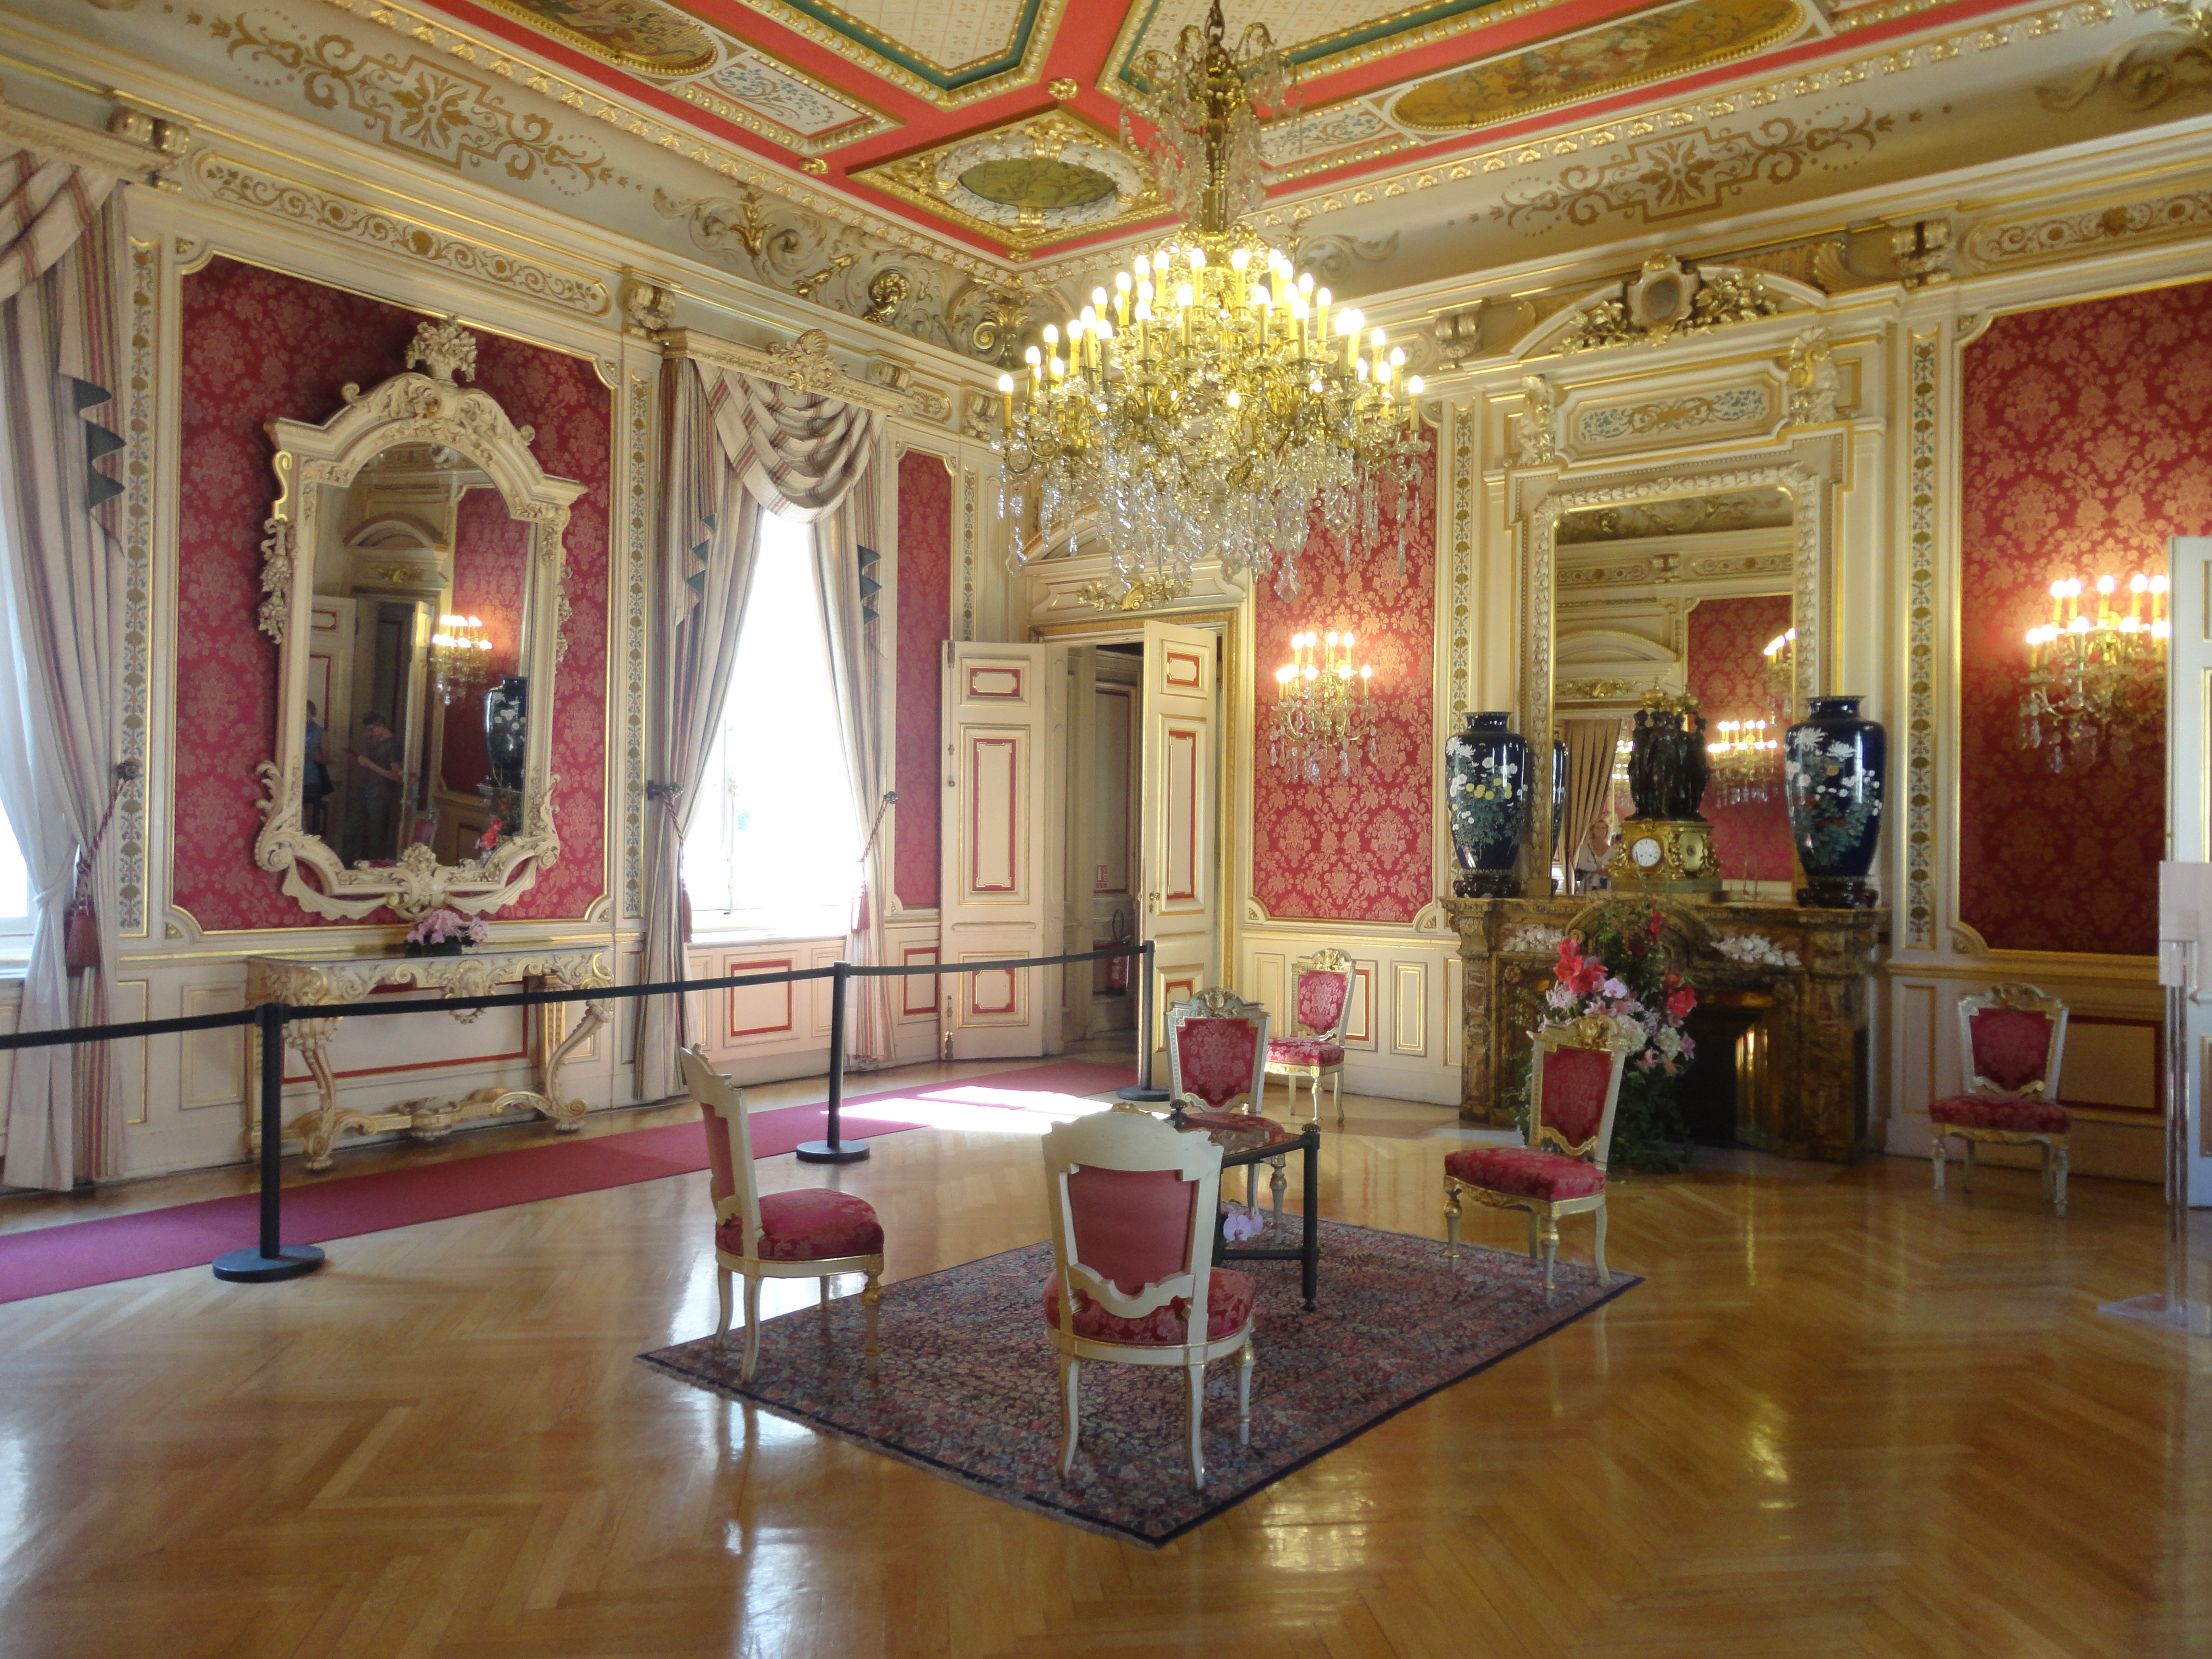 Datei salon rouge h tel de ville de lyon 1 jpg wikipedia - Salon de l emploi lyon ...